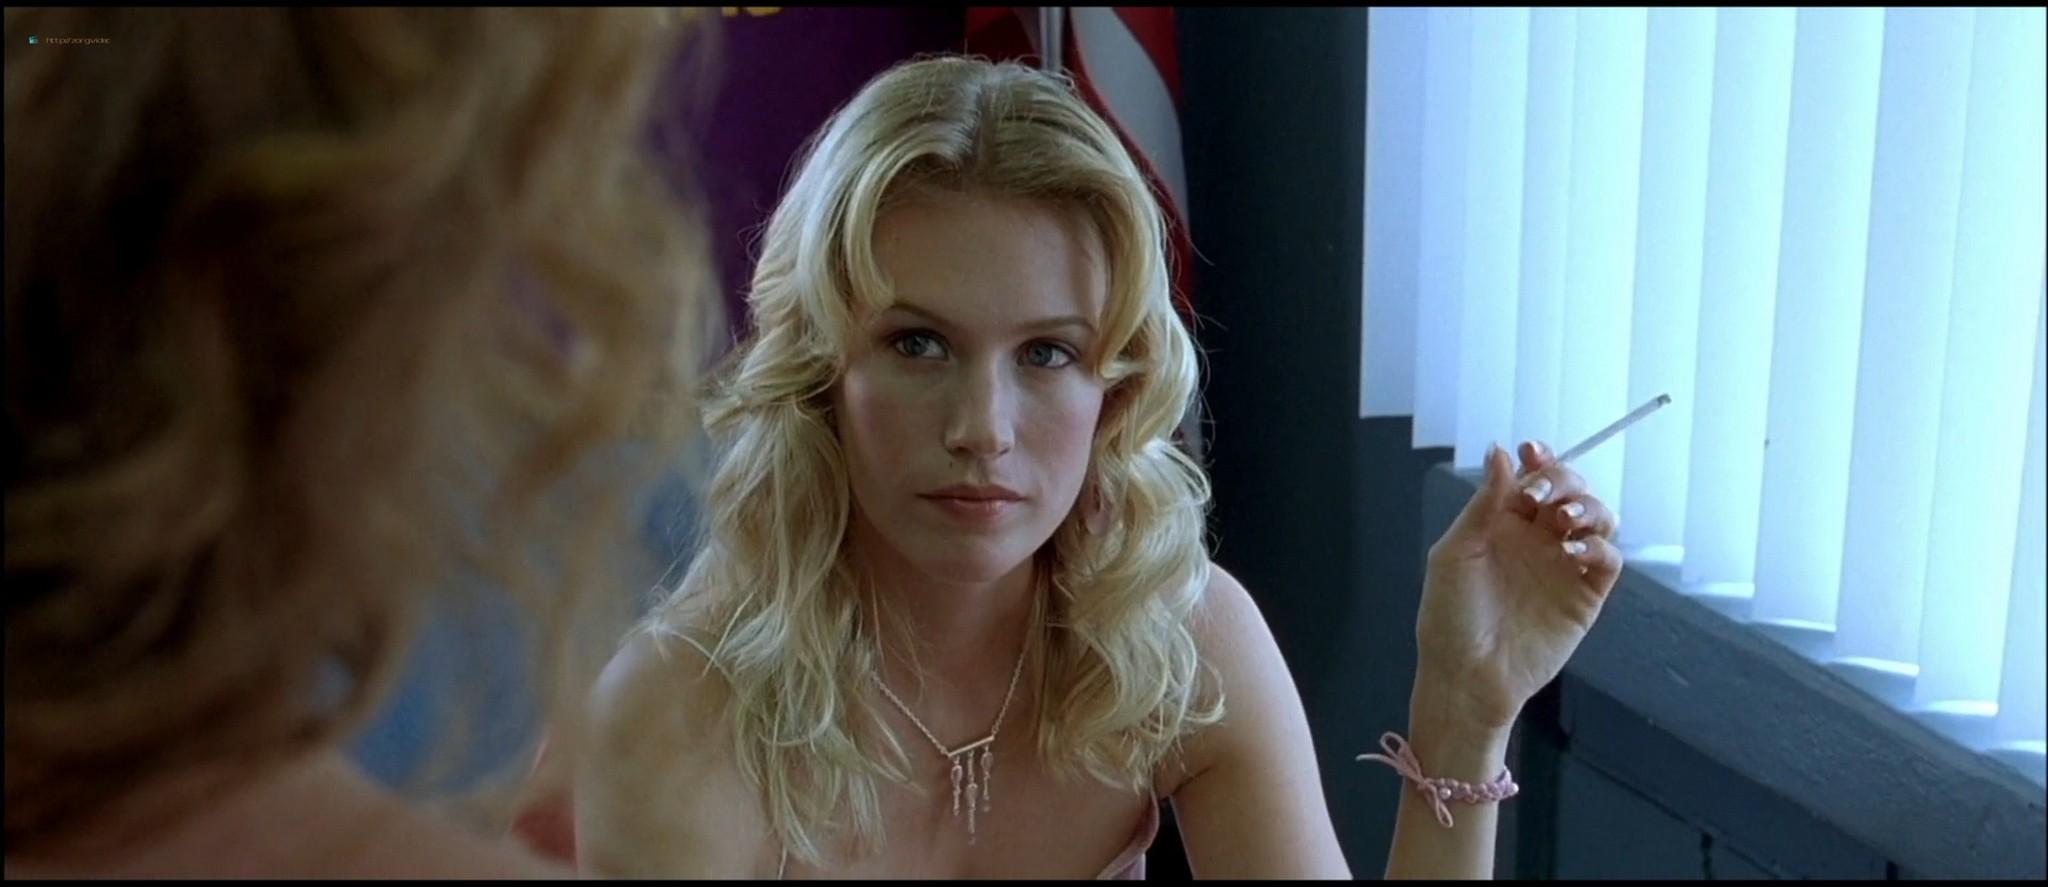 January Jones sex doggy style and Melissa Leo naked - The Three Burials of Melquiades Estrada HD 1080p BluRay (6)